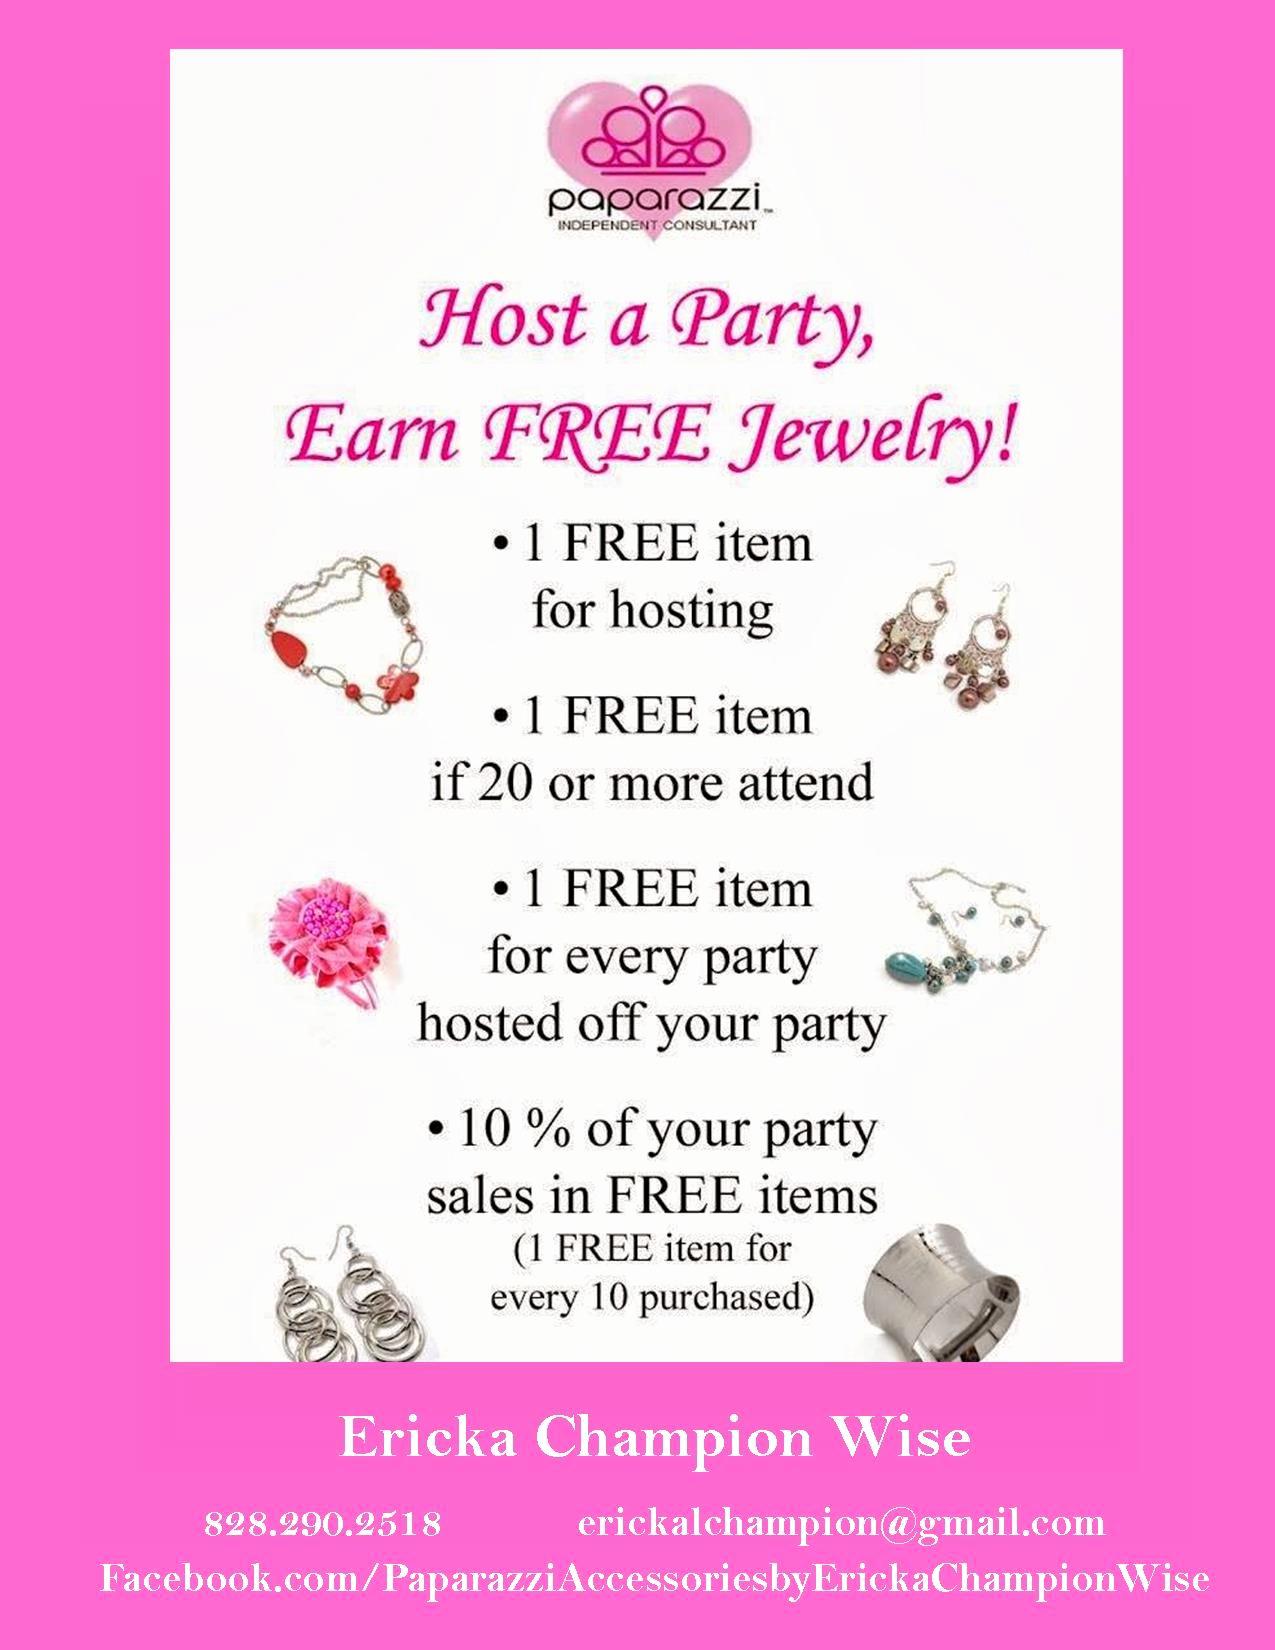 Jewelry Party Invitation Template Beautiful Paparazzi Accessories Hostess Rewards